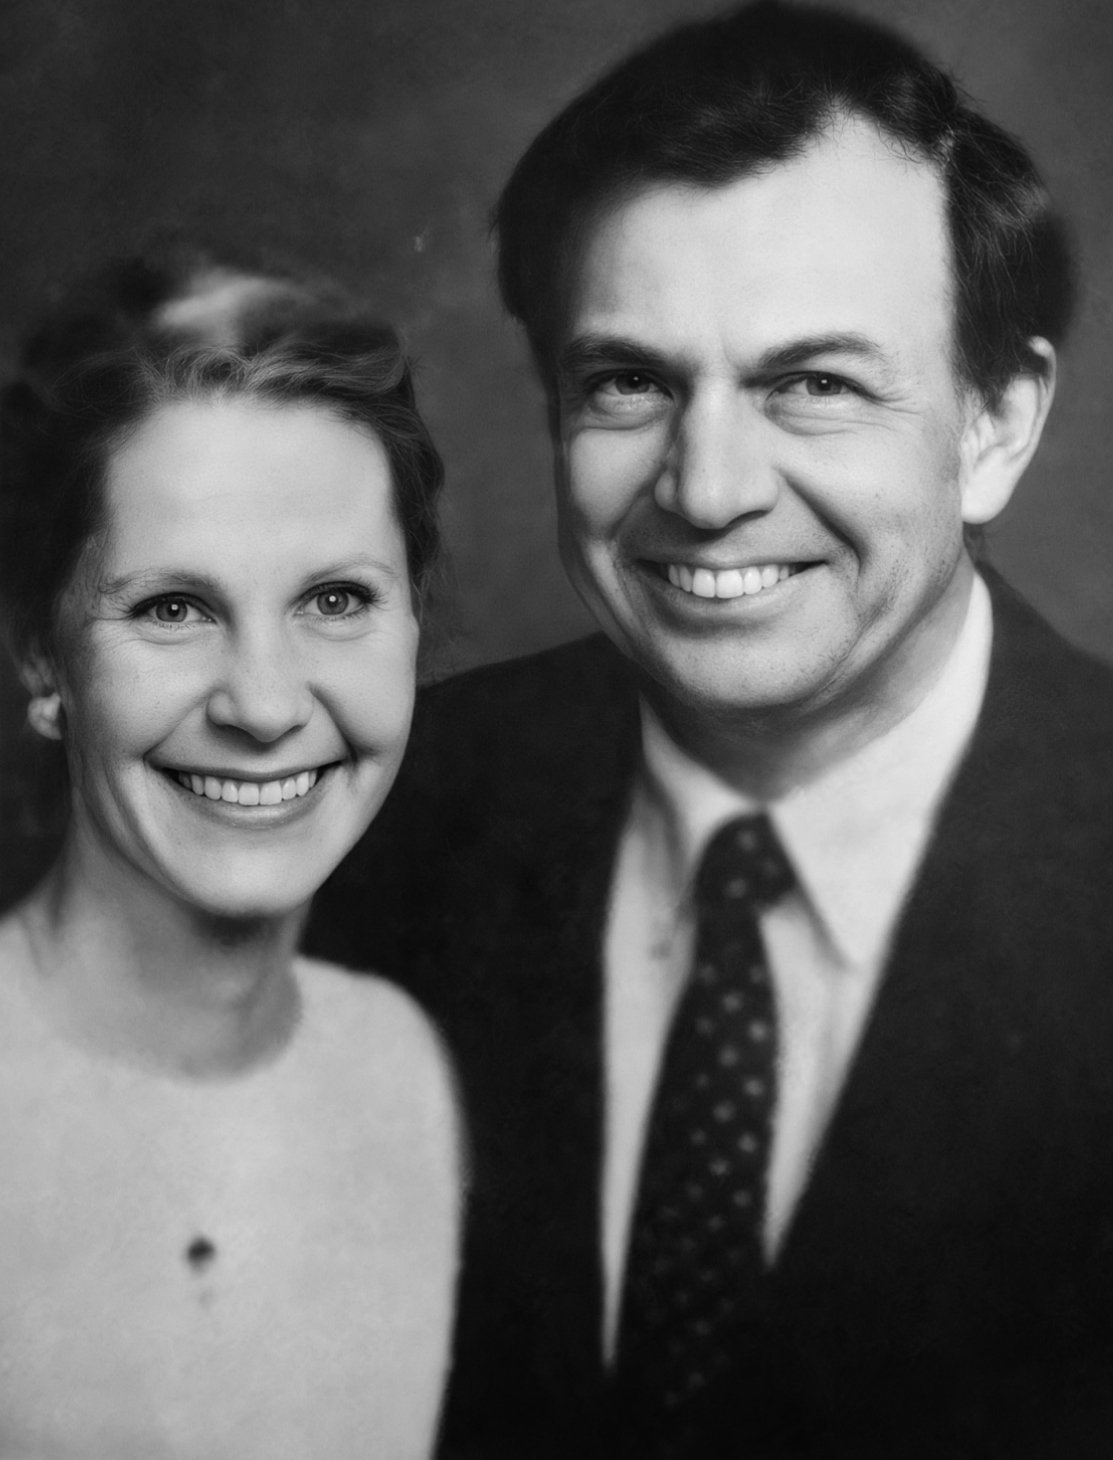 Helle and Richard Crafts, The Woodchipper Murder, The Woodchipper Murder